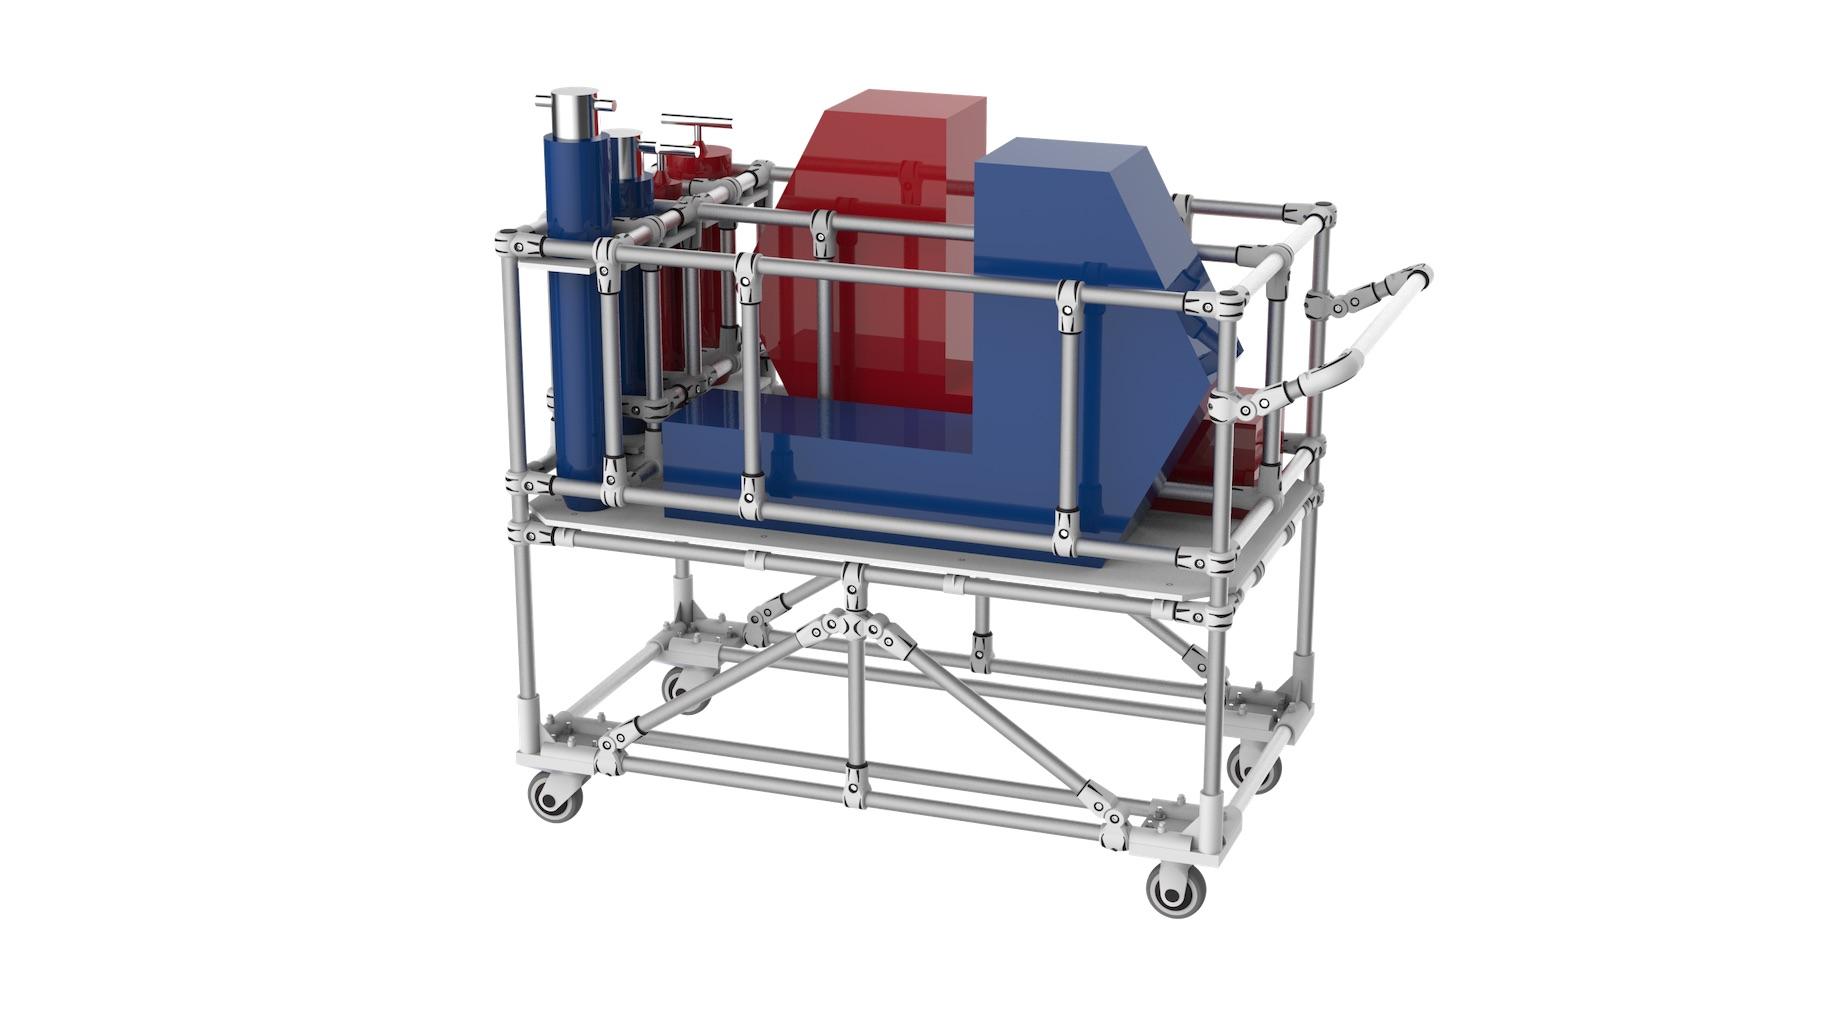 Aerospace - Handling tools support trolley.